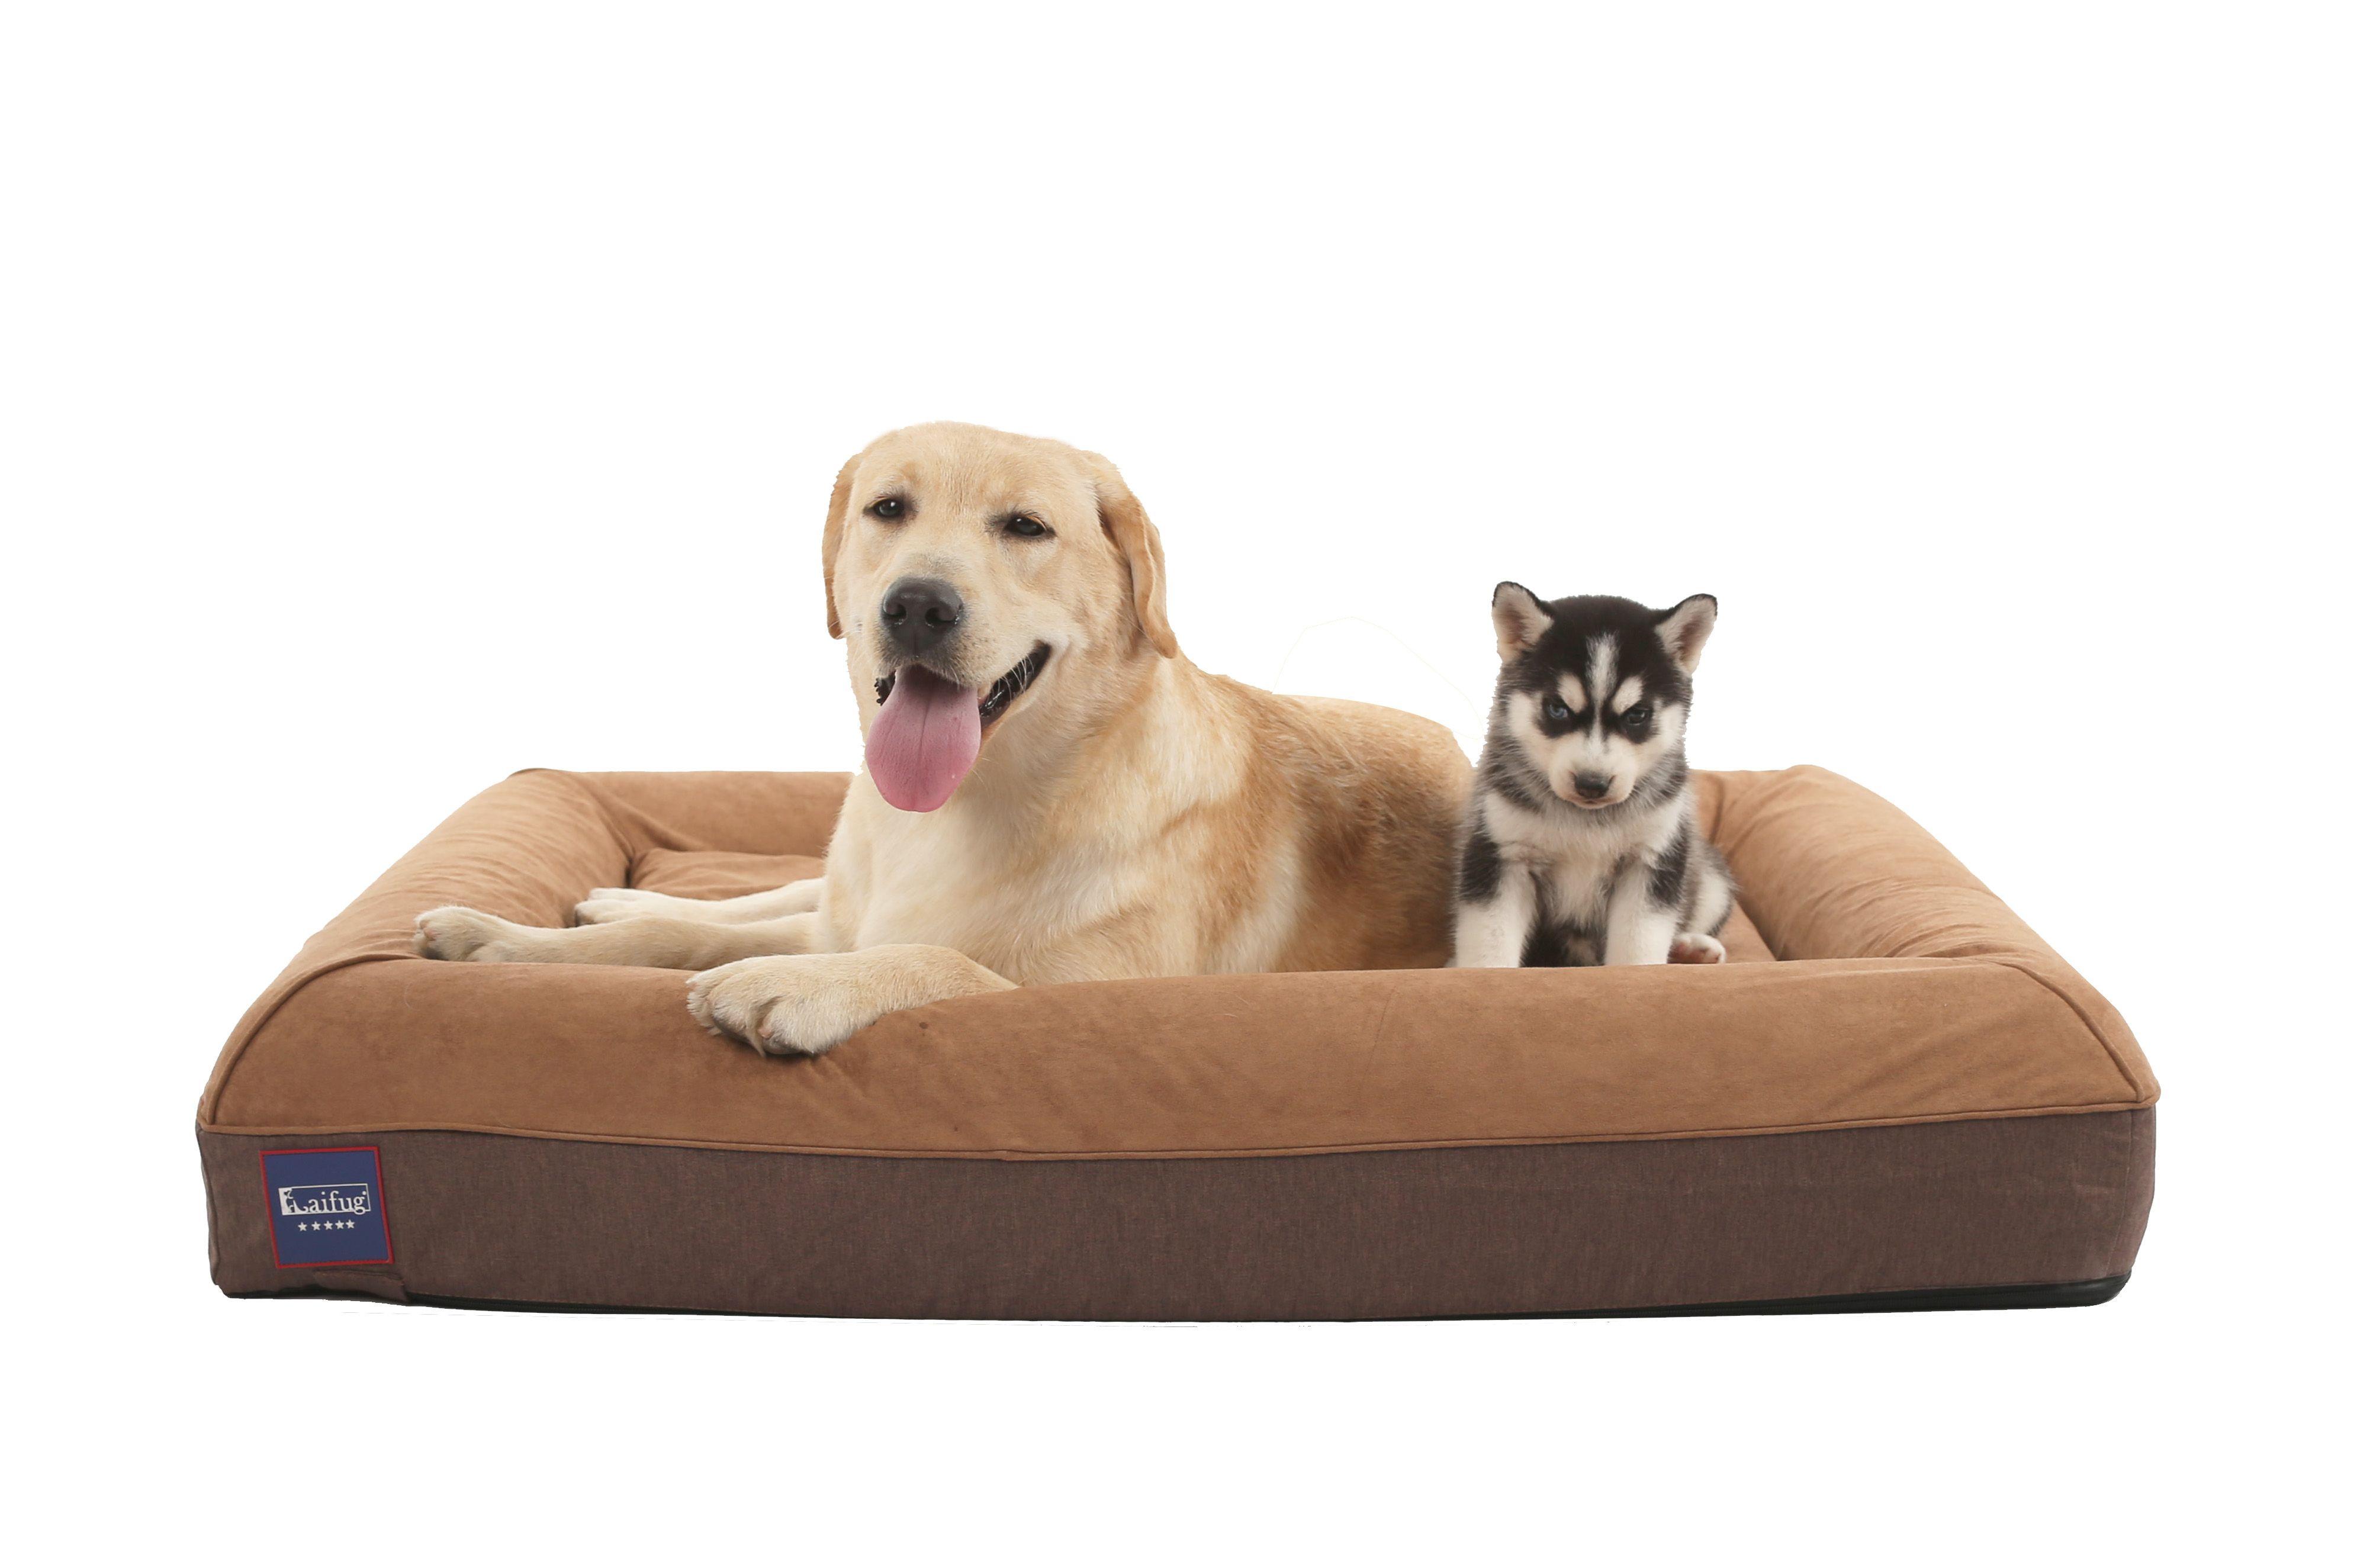 laifug orthopedic memory foam dog bed